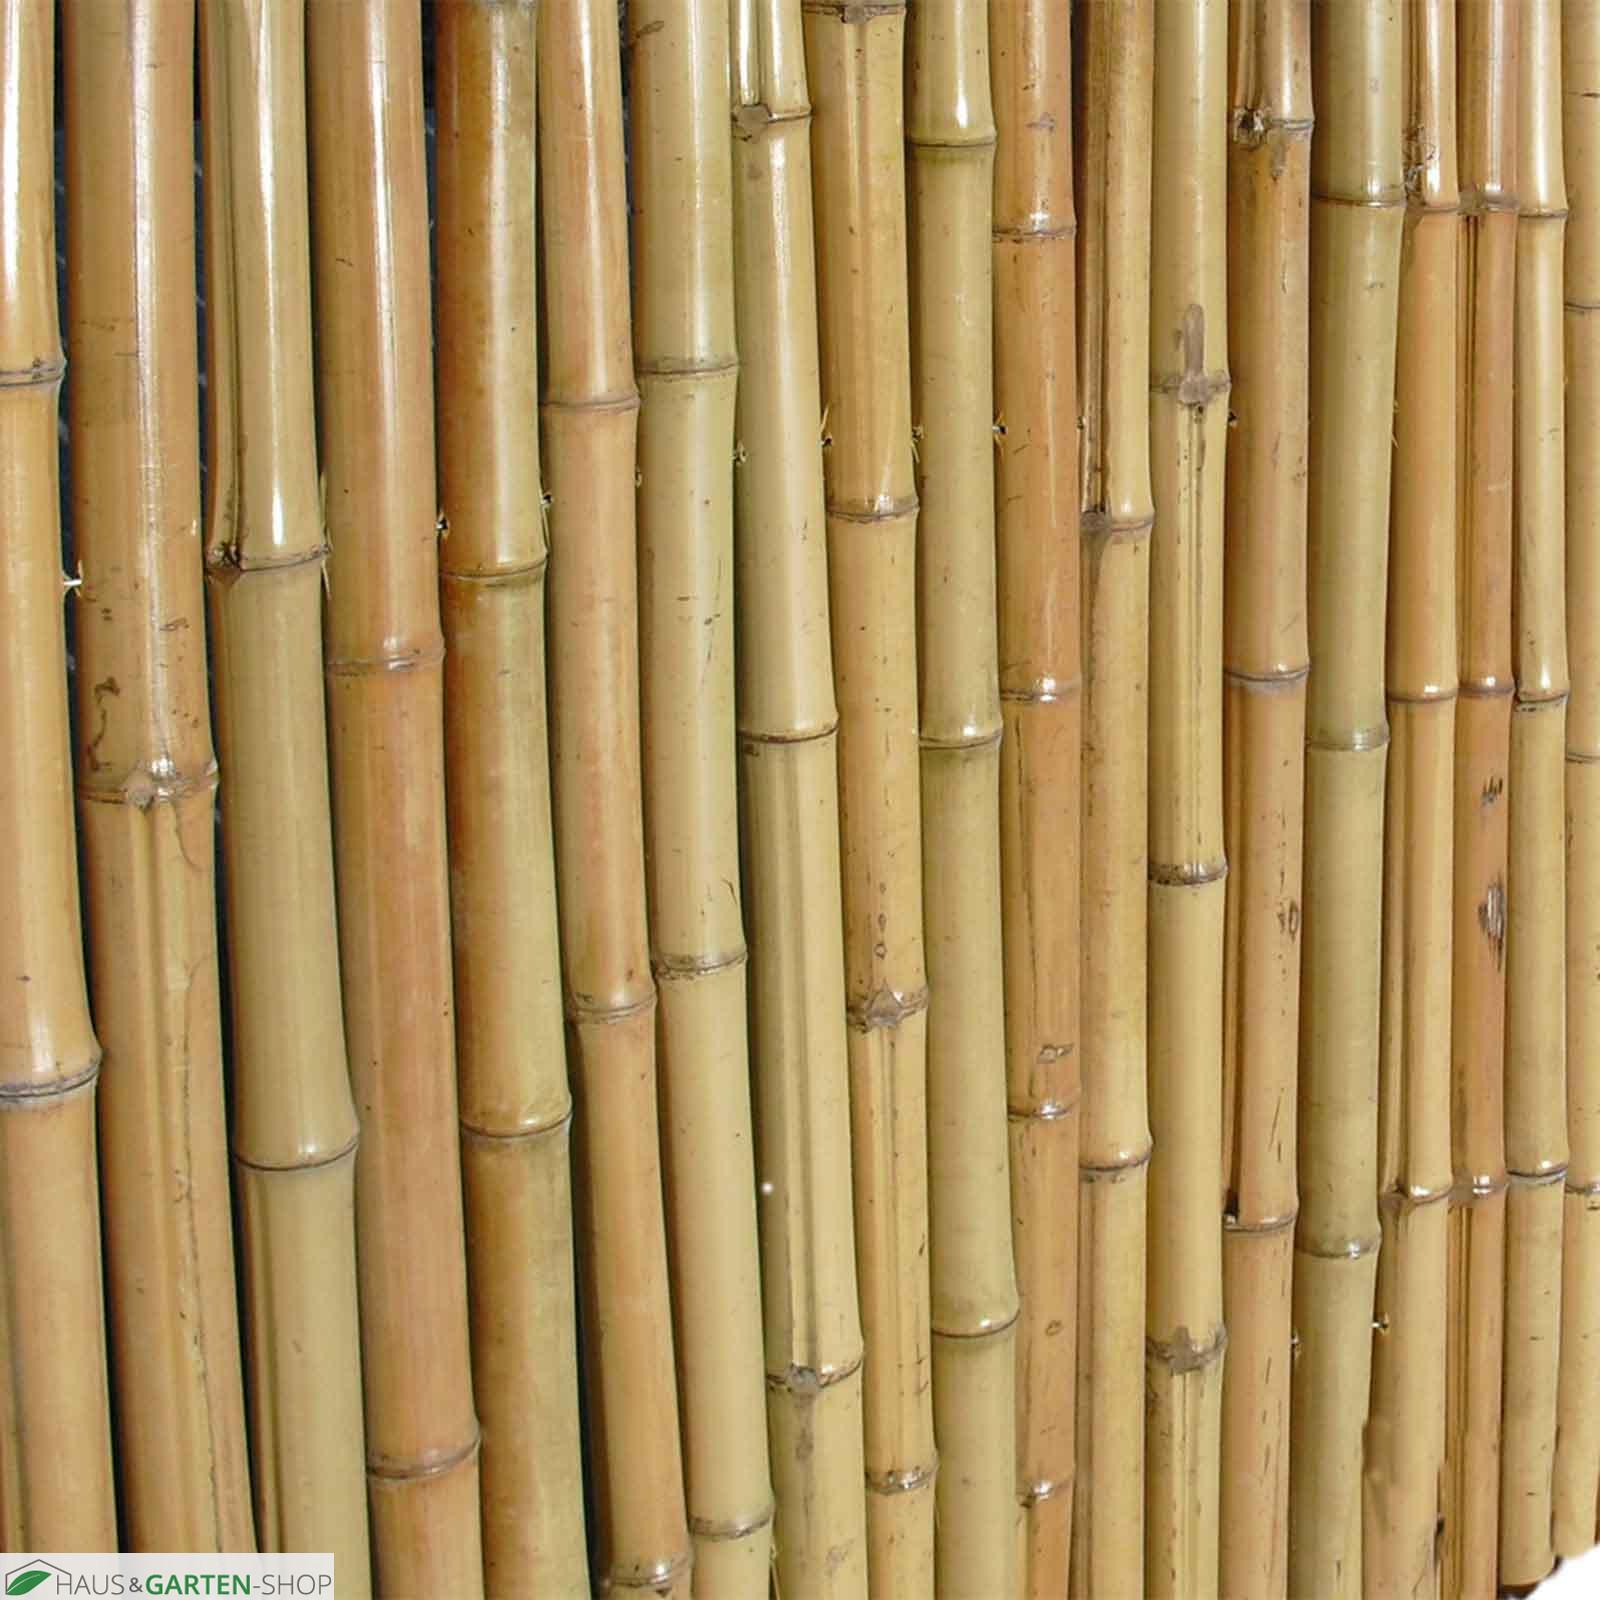 Bambusmatte Bahrain Bambusrollzaun Sichtschutzmatte